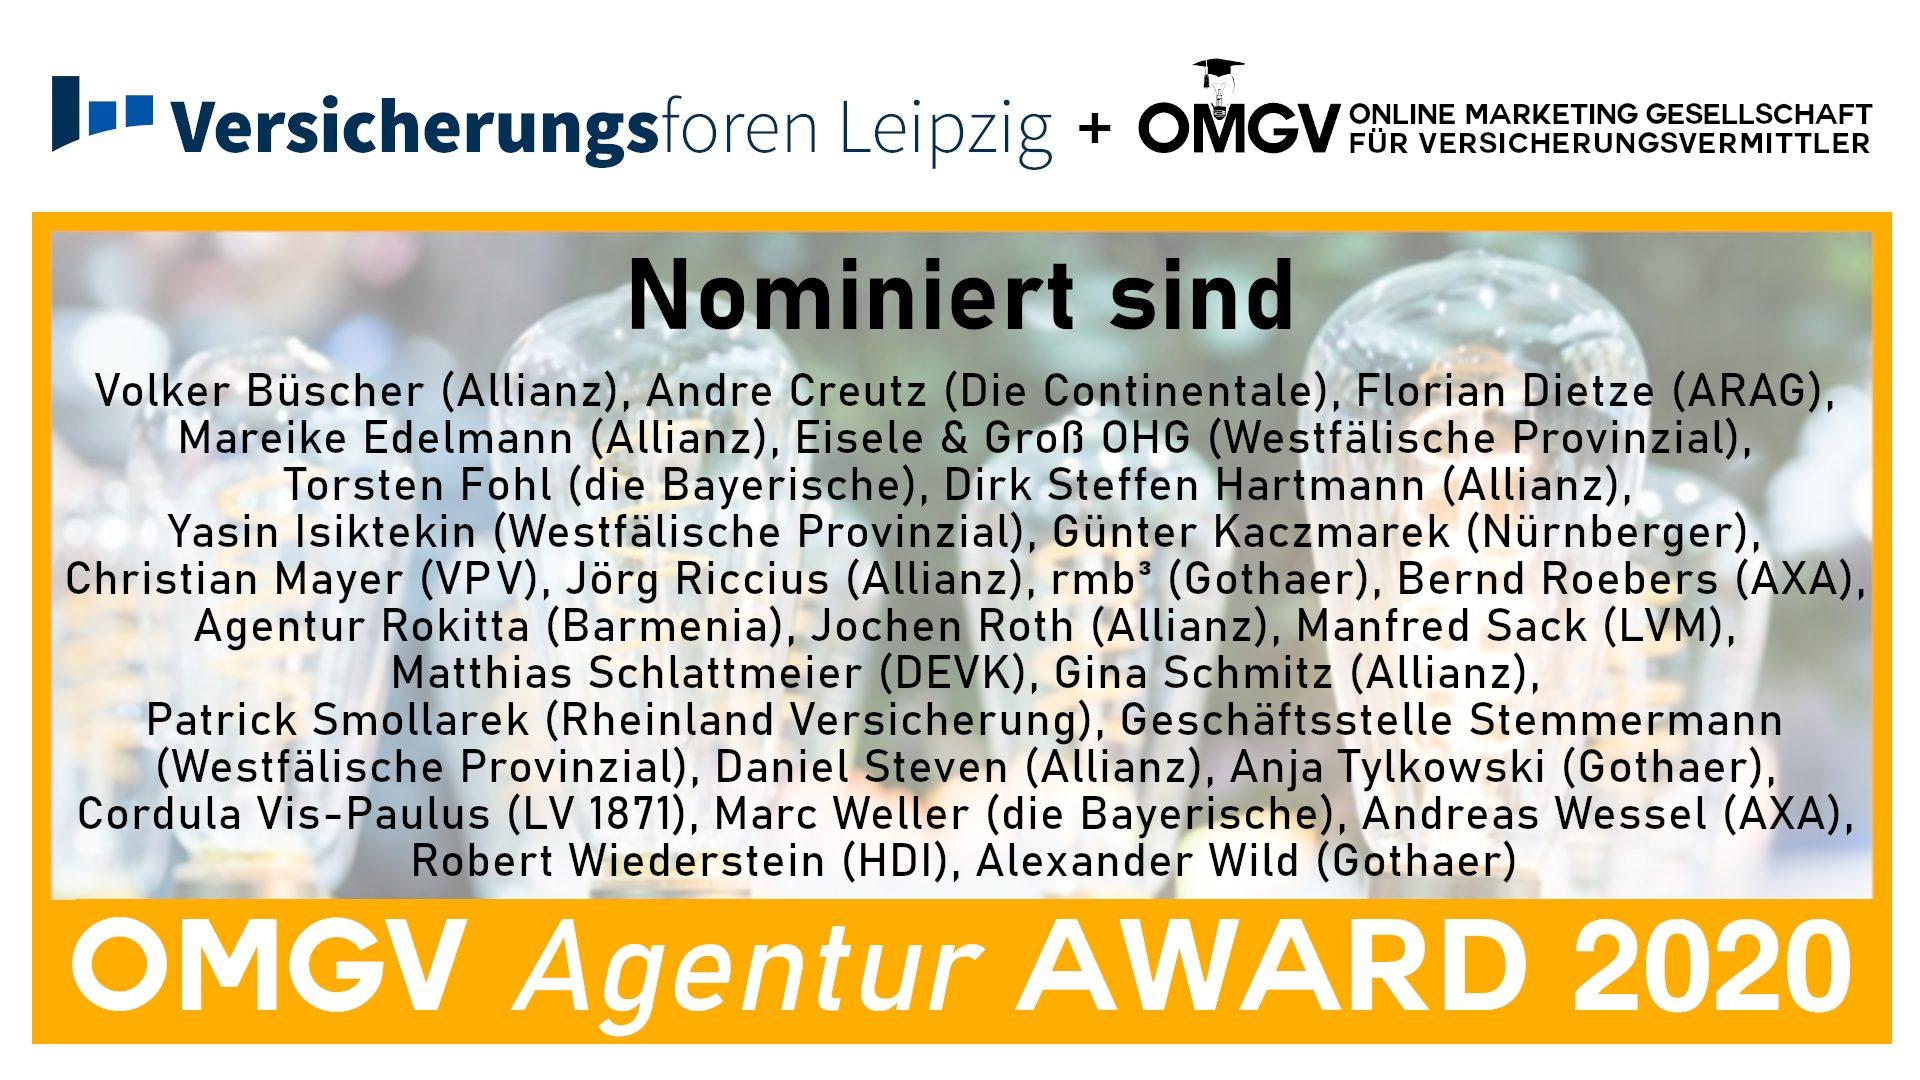 OMGV Award Nominierte Agenturen 2020